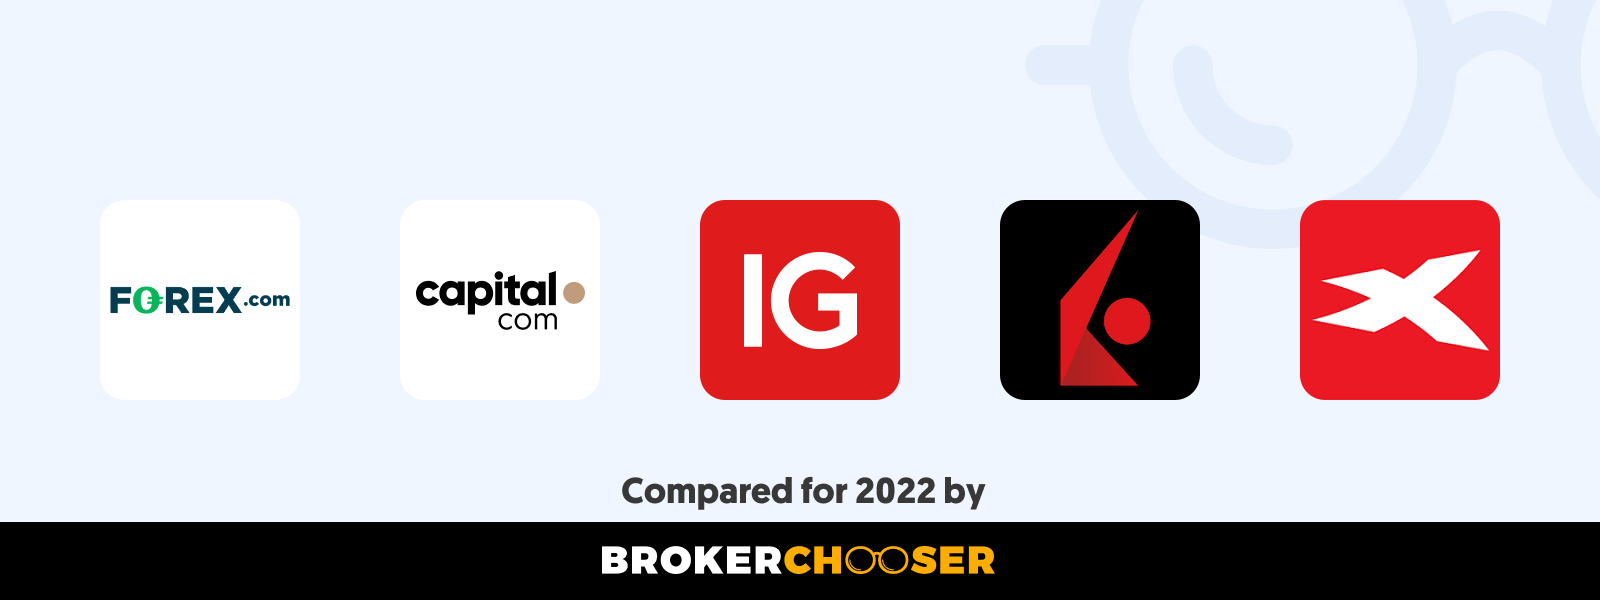 Best forex brokers for beginners in Djibouti in 2021